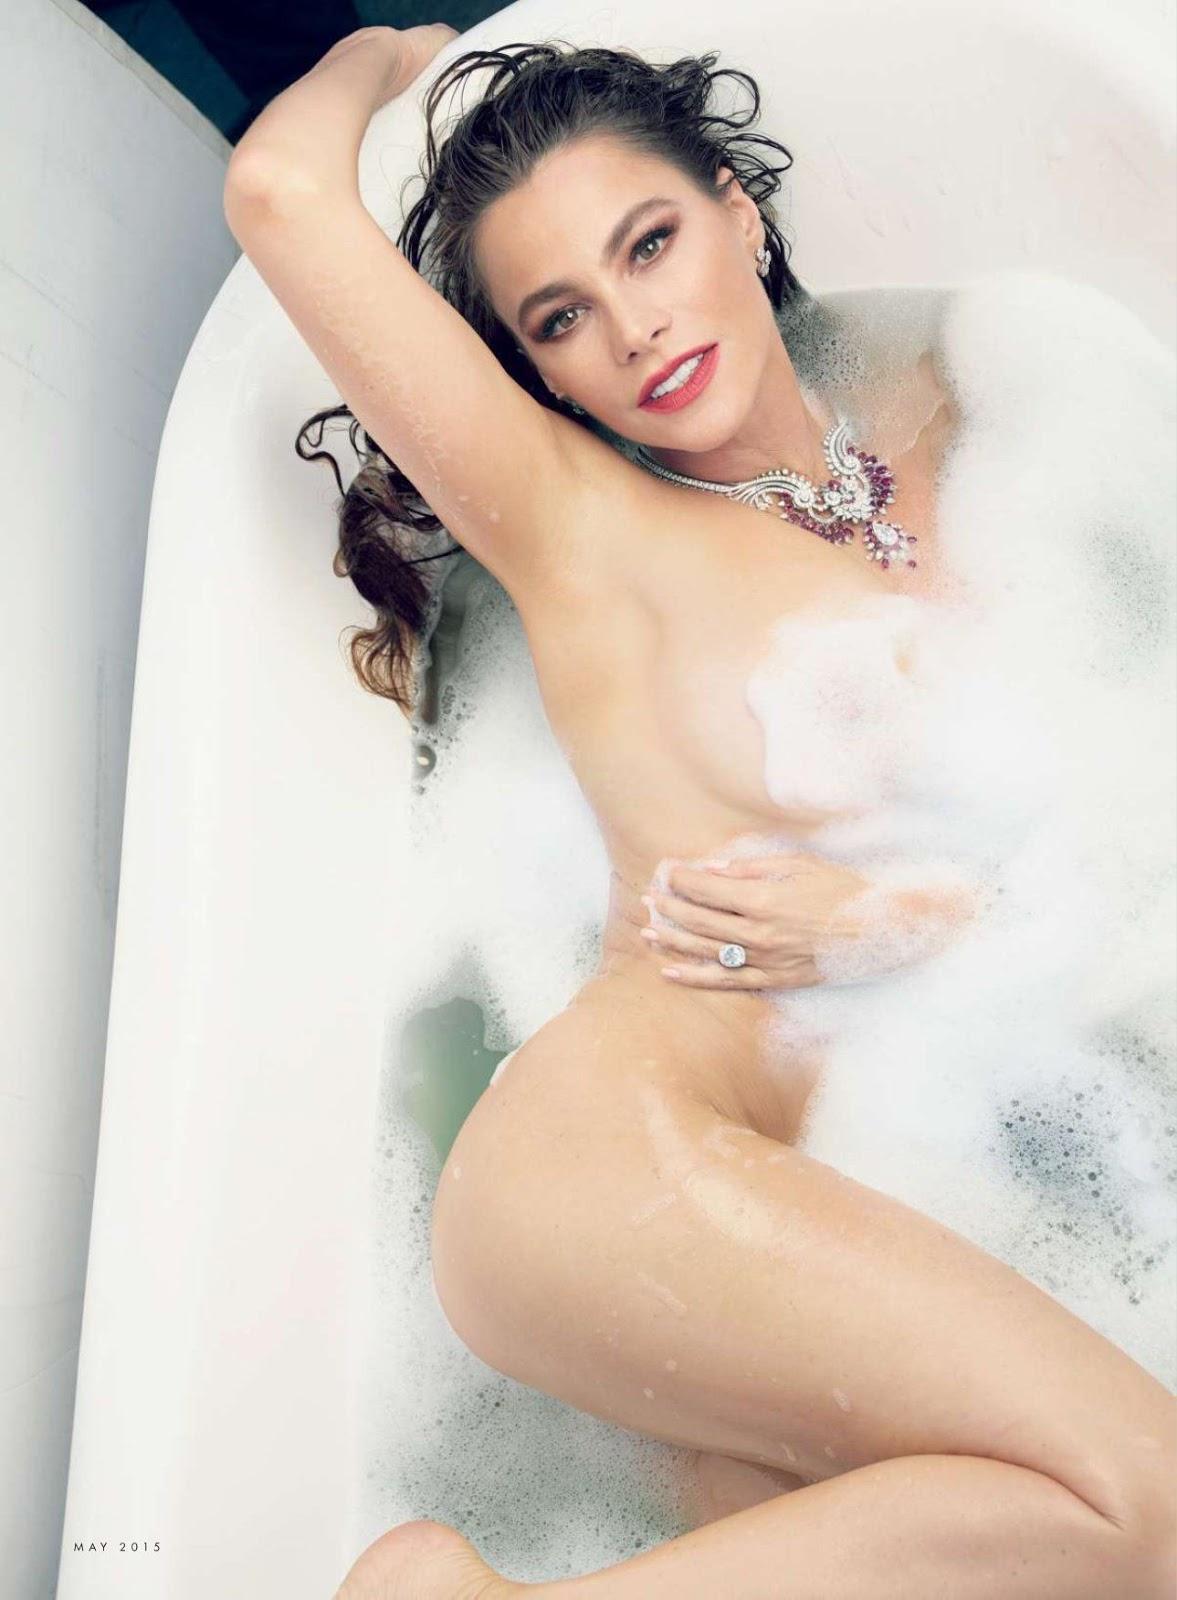 Sofia Vergara bares cleavage for Vanity Fair May 2015